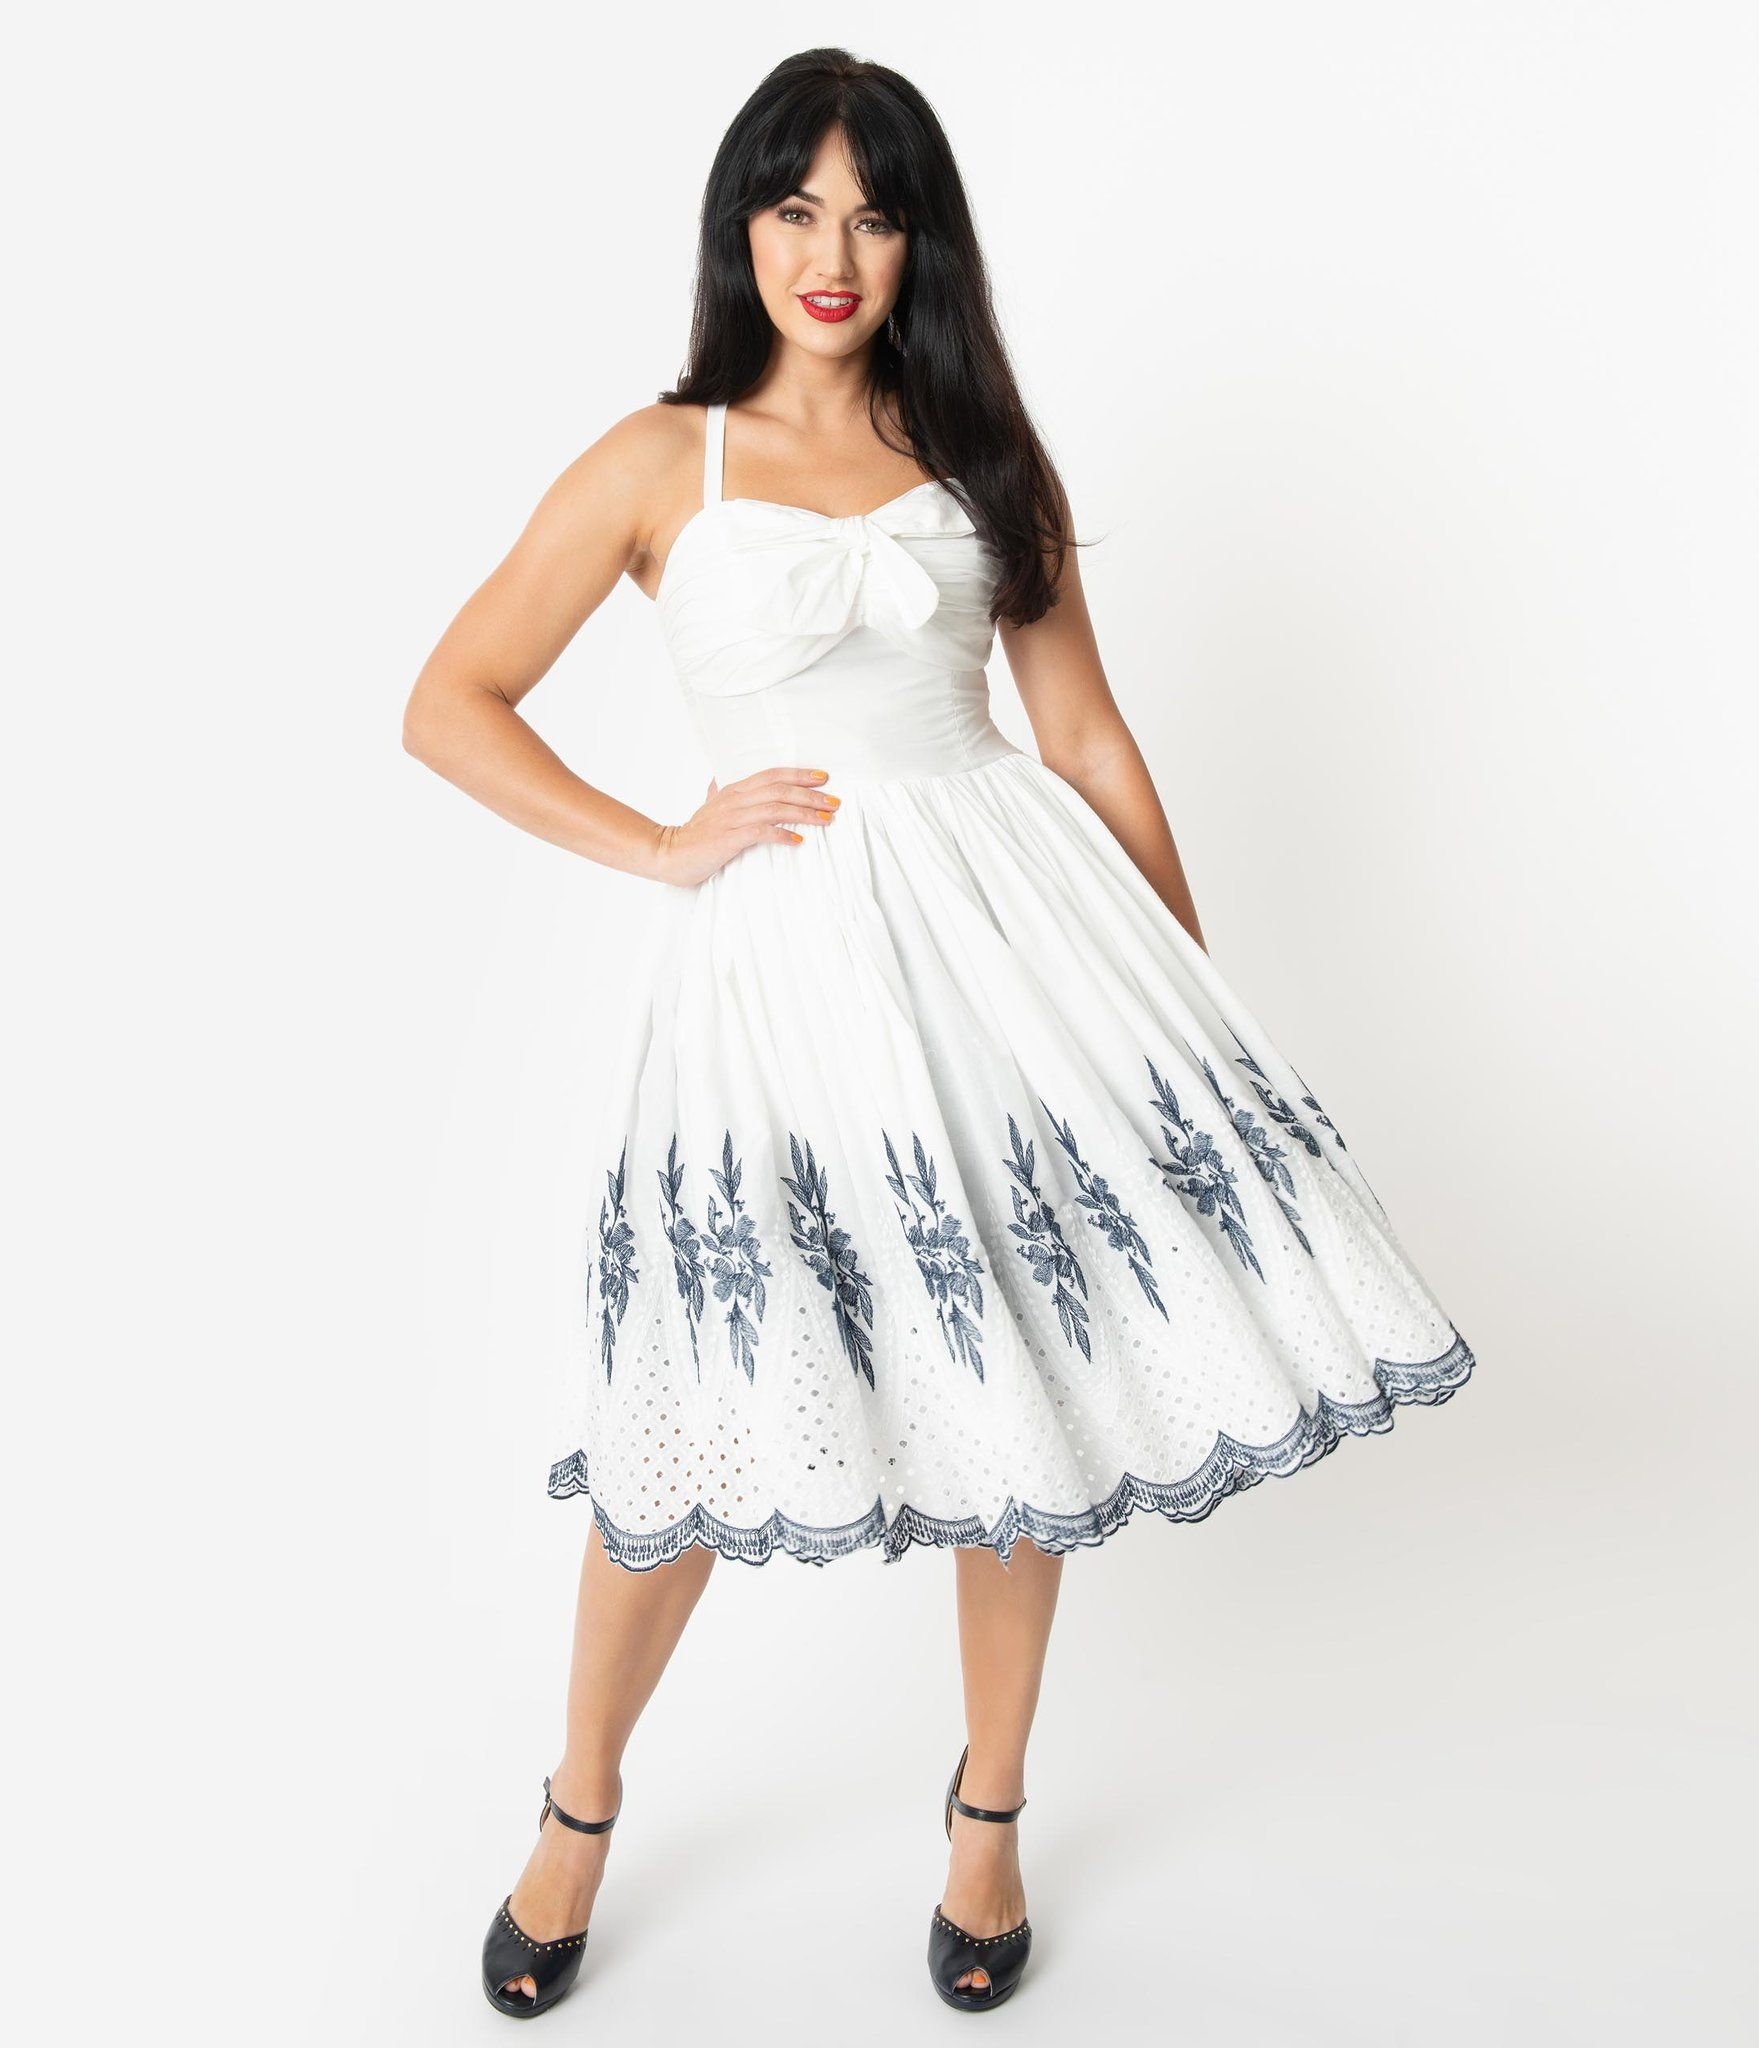 Unique Vintage 1950s White Navy Embroidery Golightly Swing Dress Swing Dress Dresses Unique Dresses [ 2048 x 1759 Pixel ]